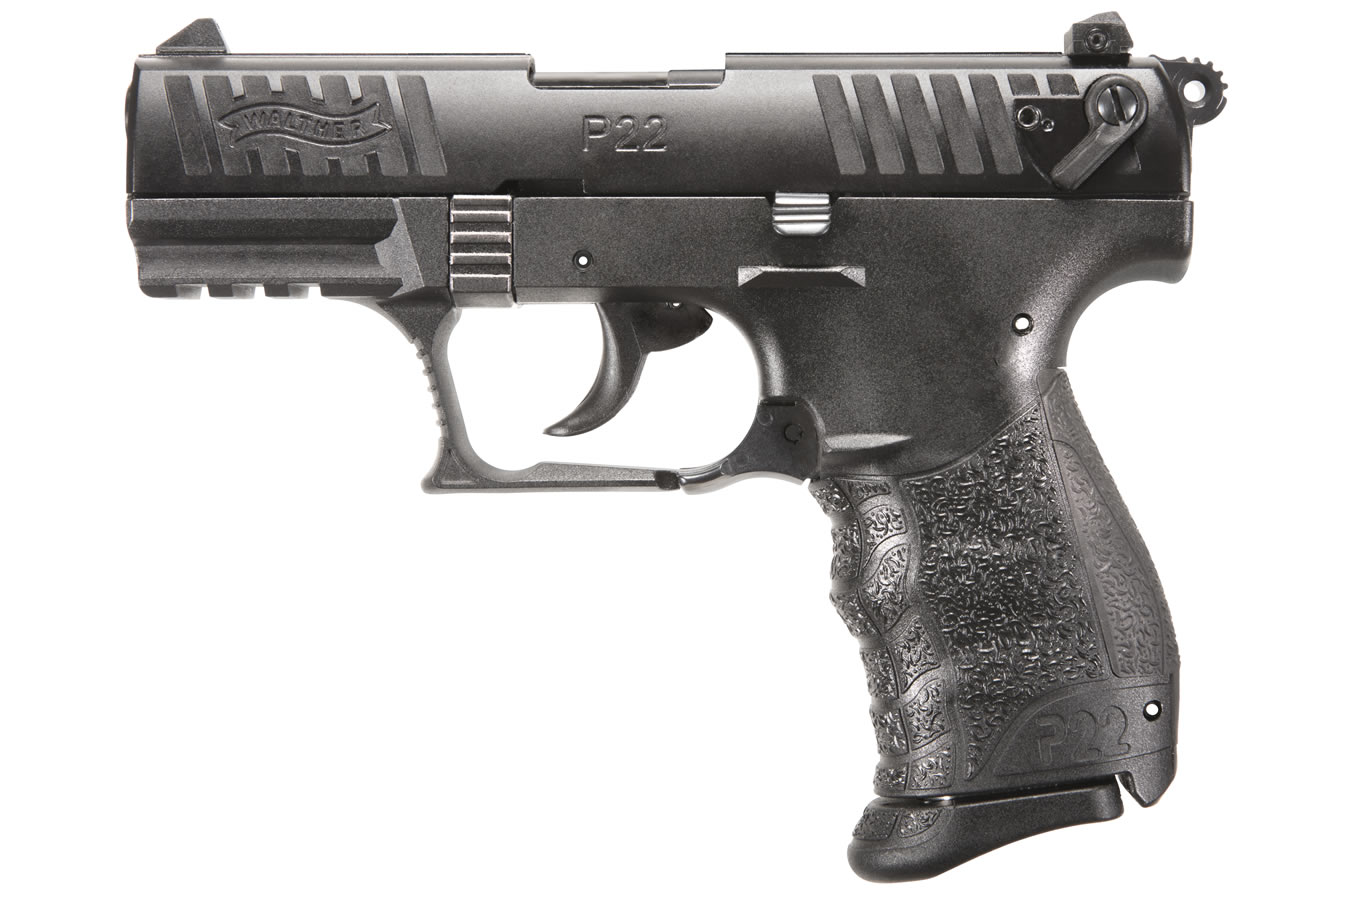 Walther P22 Qd 22lr Rimfire Pistol With Decocker Vance